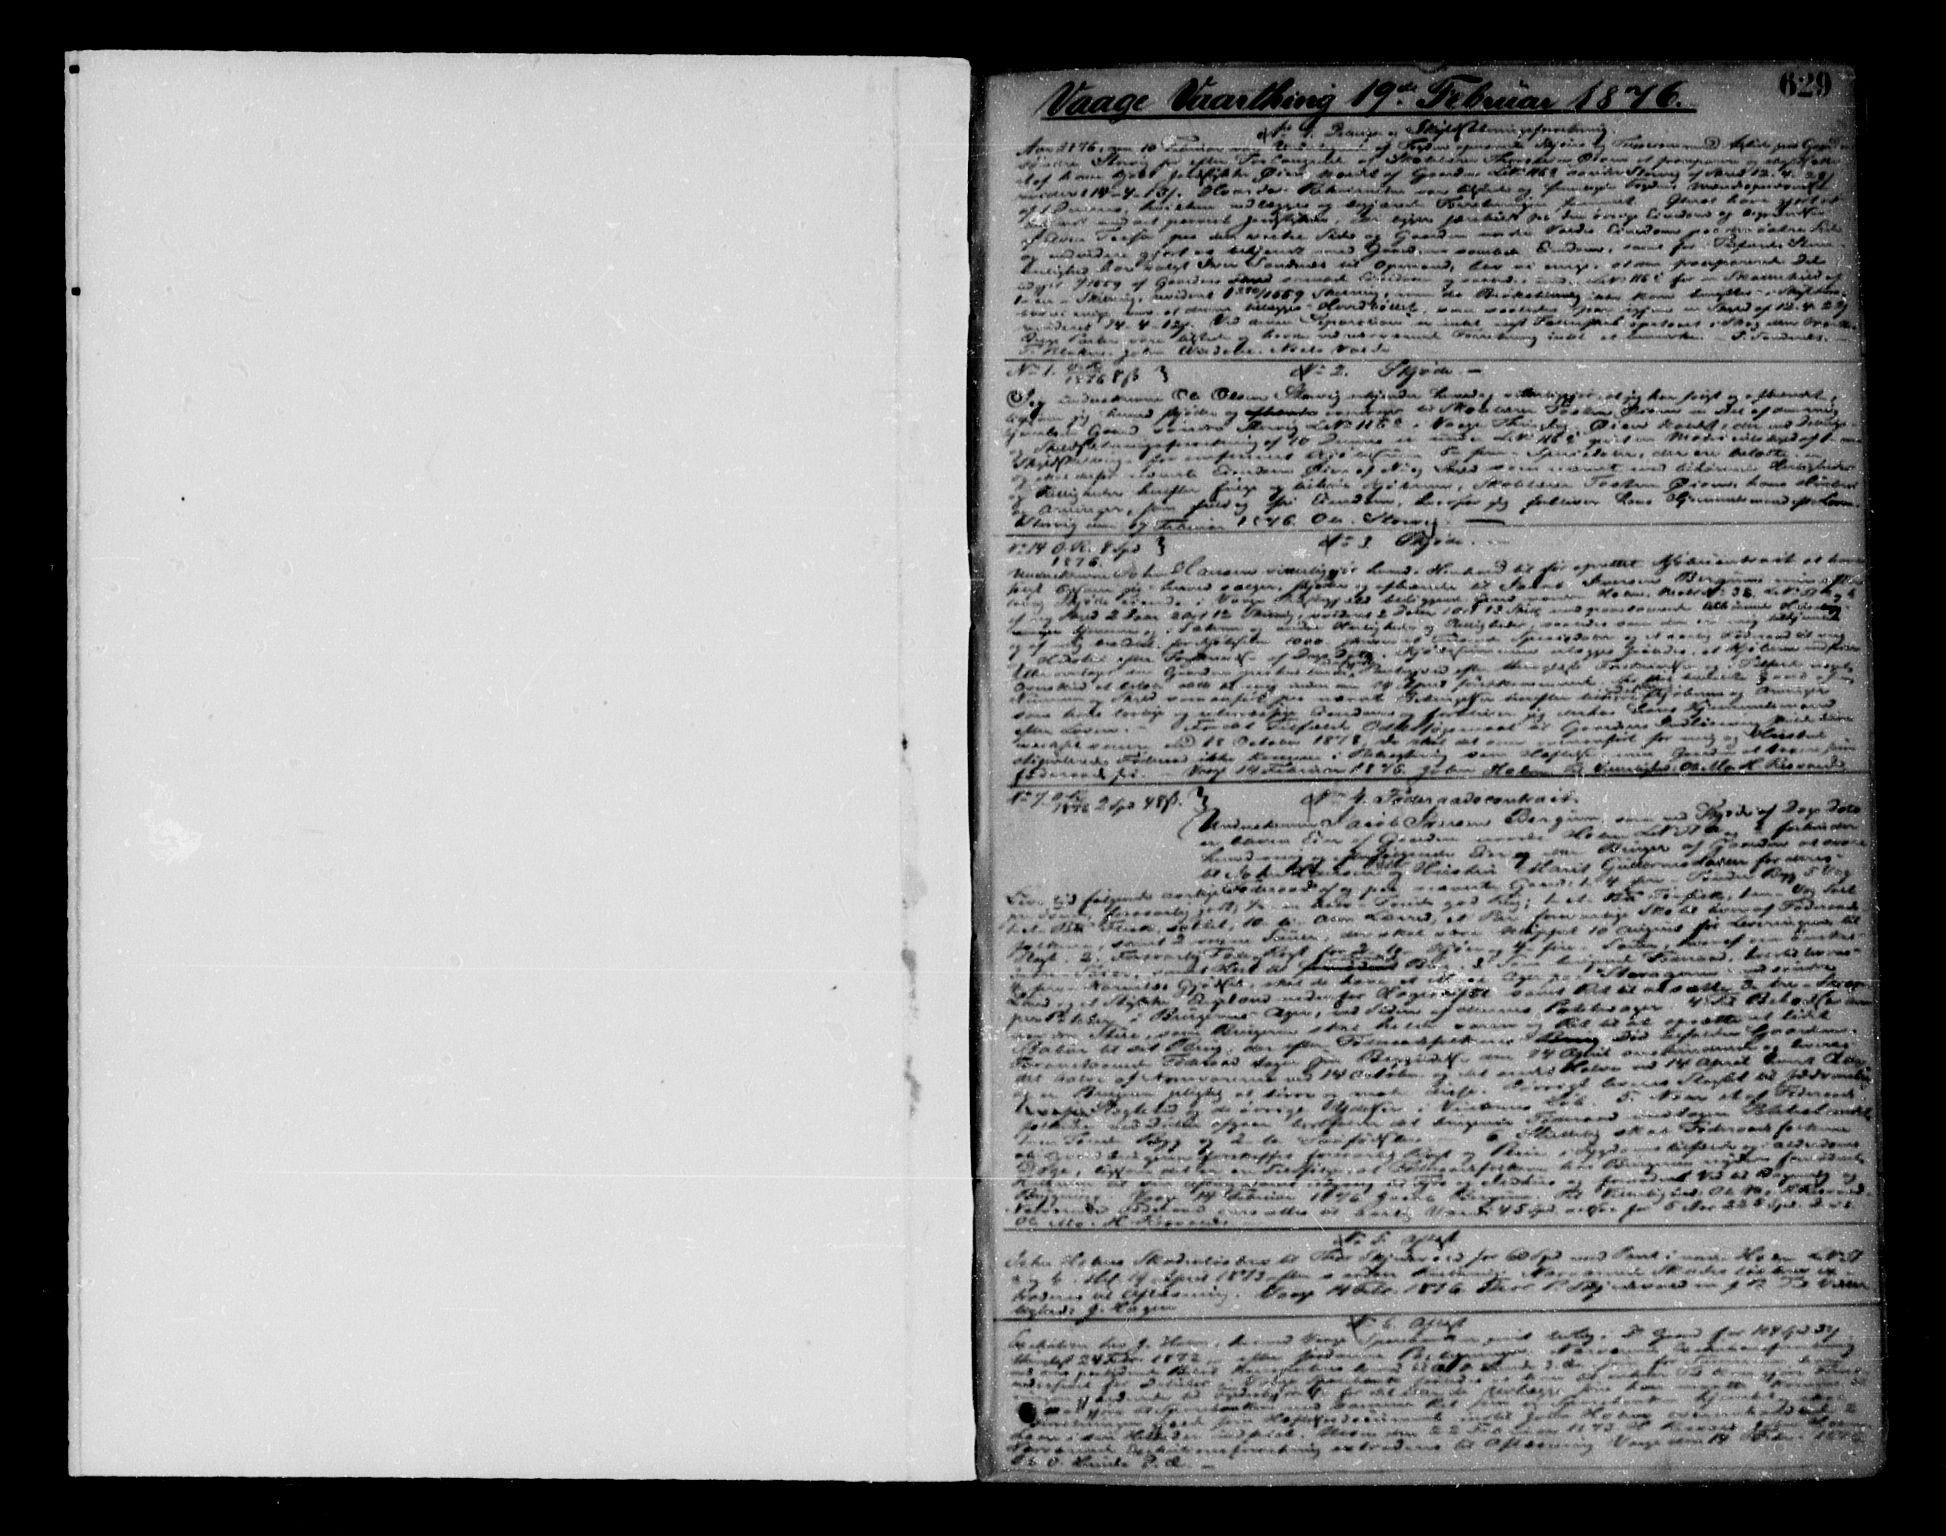 SAH, Nord-Gudbrandsdal tingrett, H/Hb/Hba/L0010B: Pantebok nr. 10b, 1876-1880, s. 629